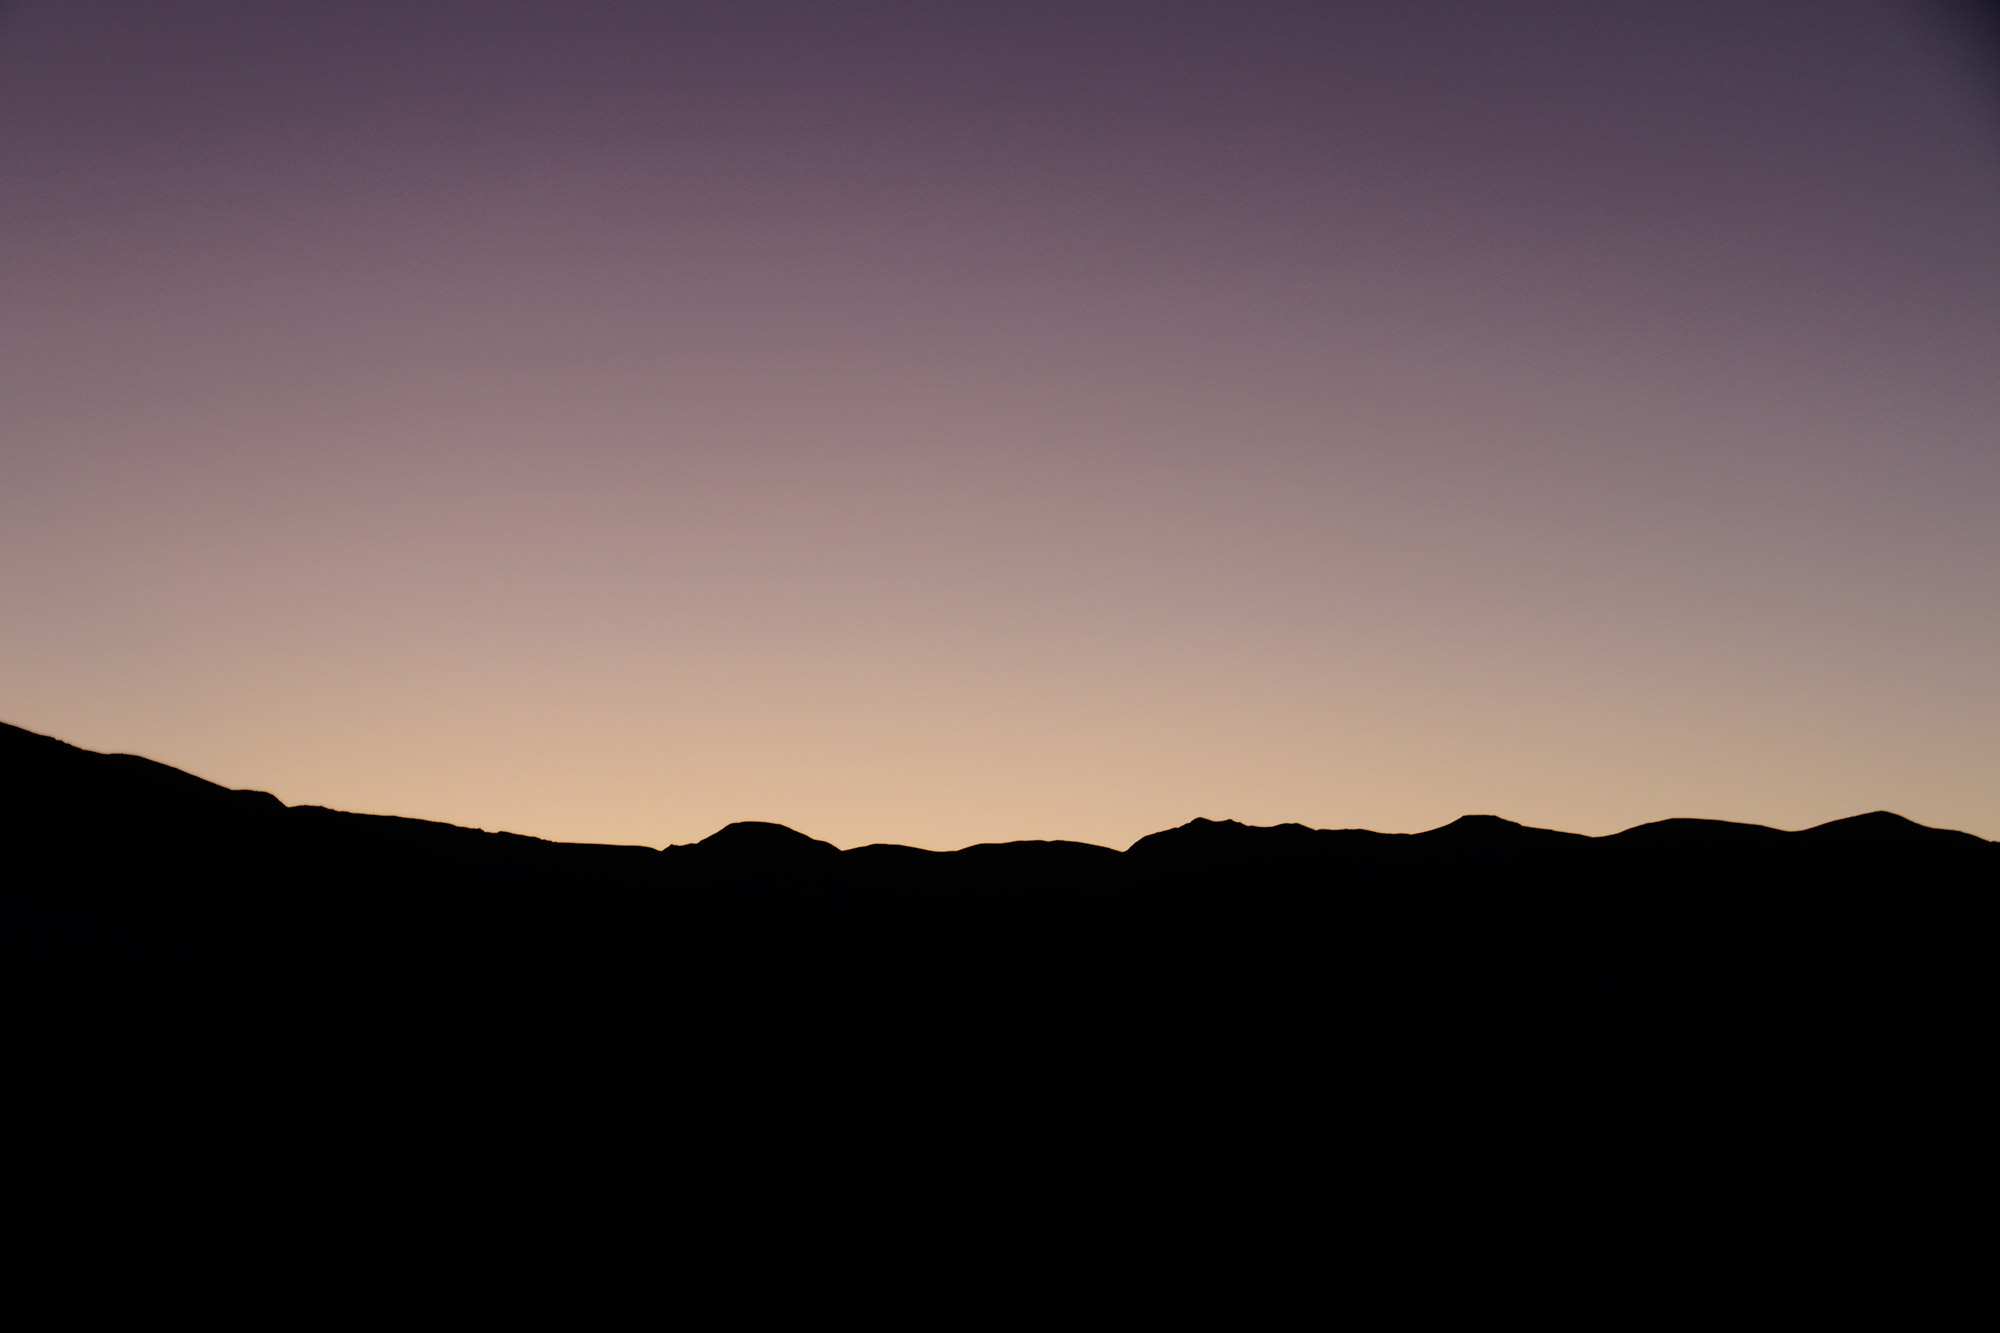 Amerika dag 18 - Death Valley National Park - Zonsonergang